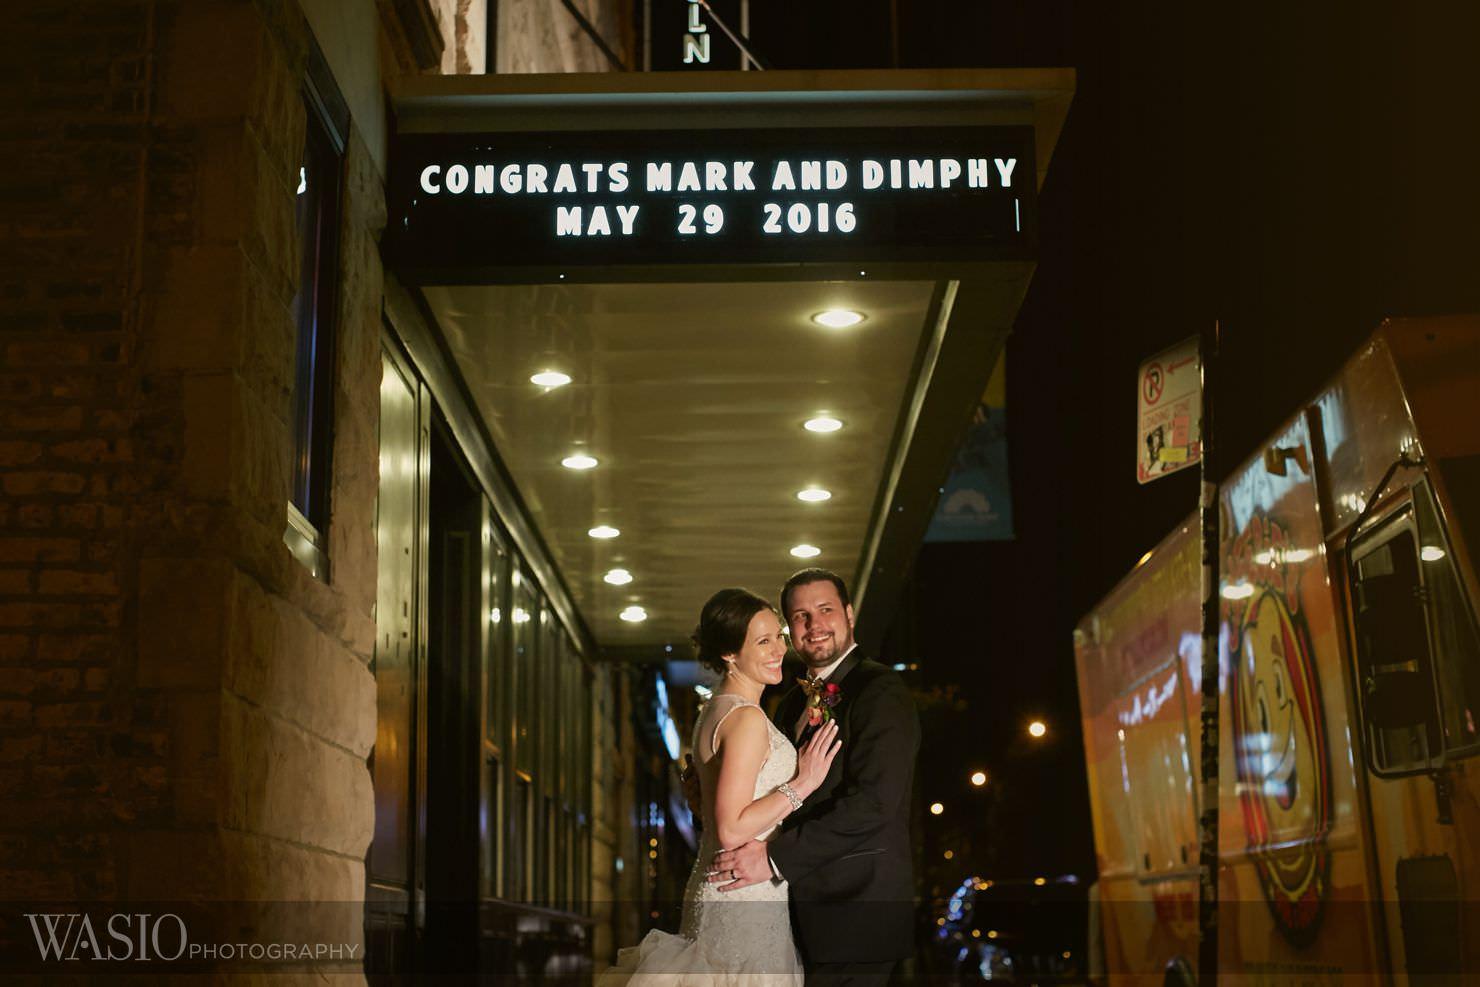 044_Lincoln-Park-Wedding_Dimphy-Mark__O3A0618 Lincoln Park Wedding - Dimphy & Mark